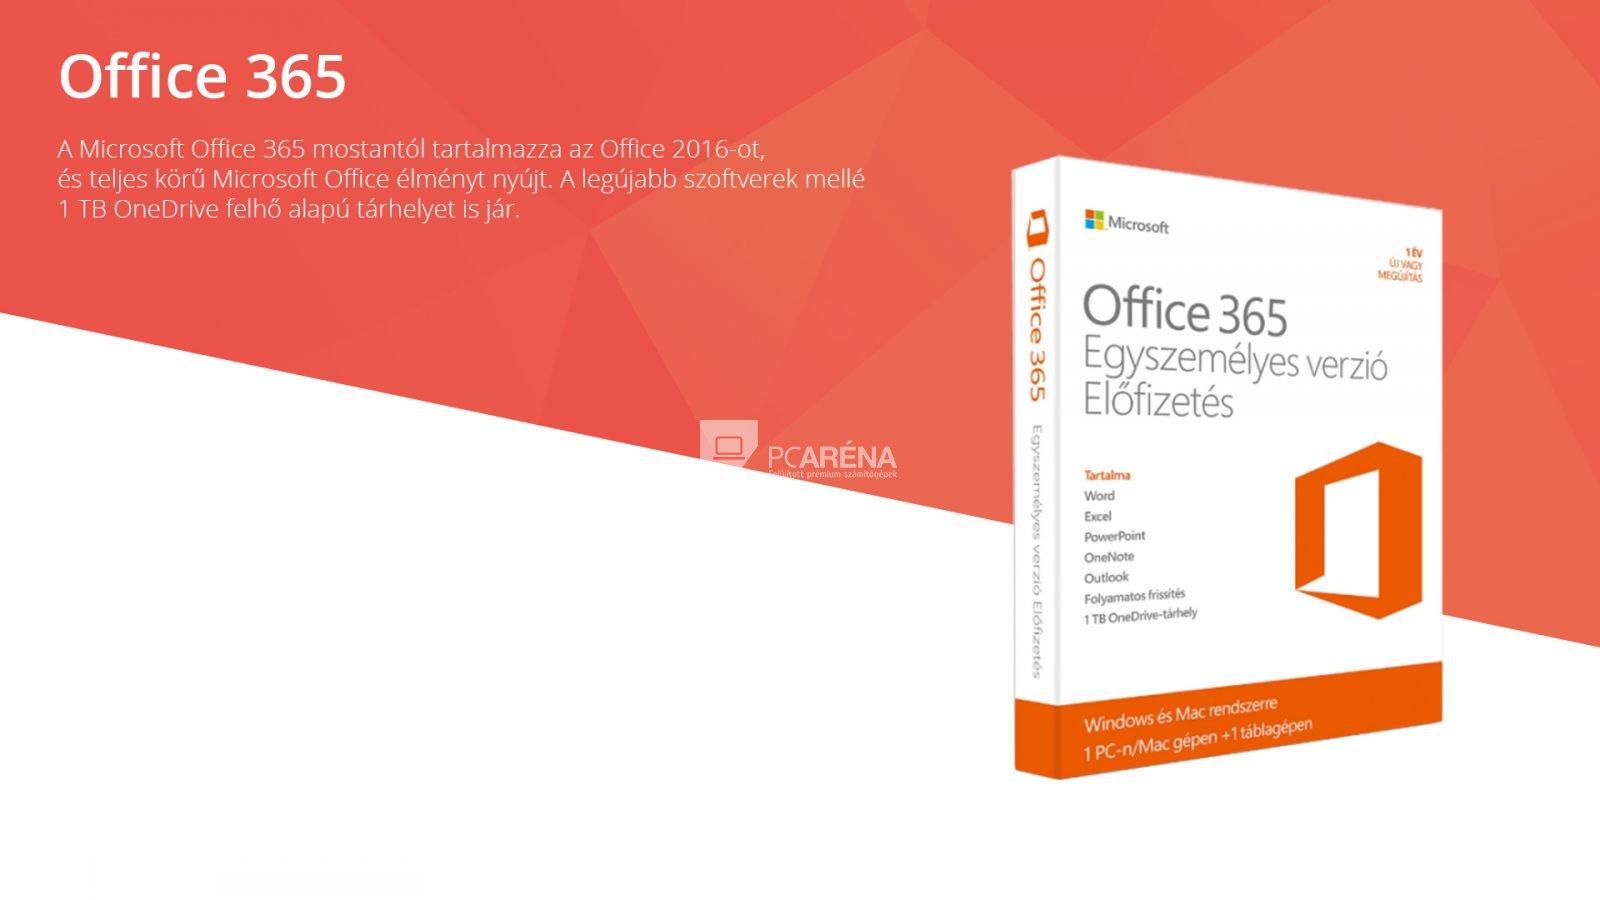 Microsoft Office 365 Irodai szoftvercsomag